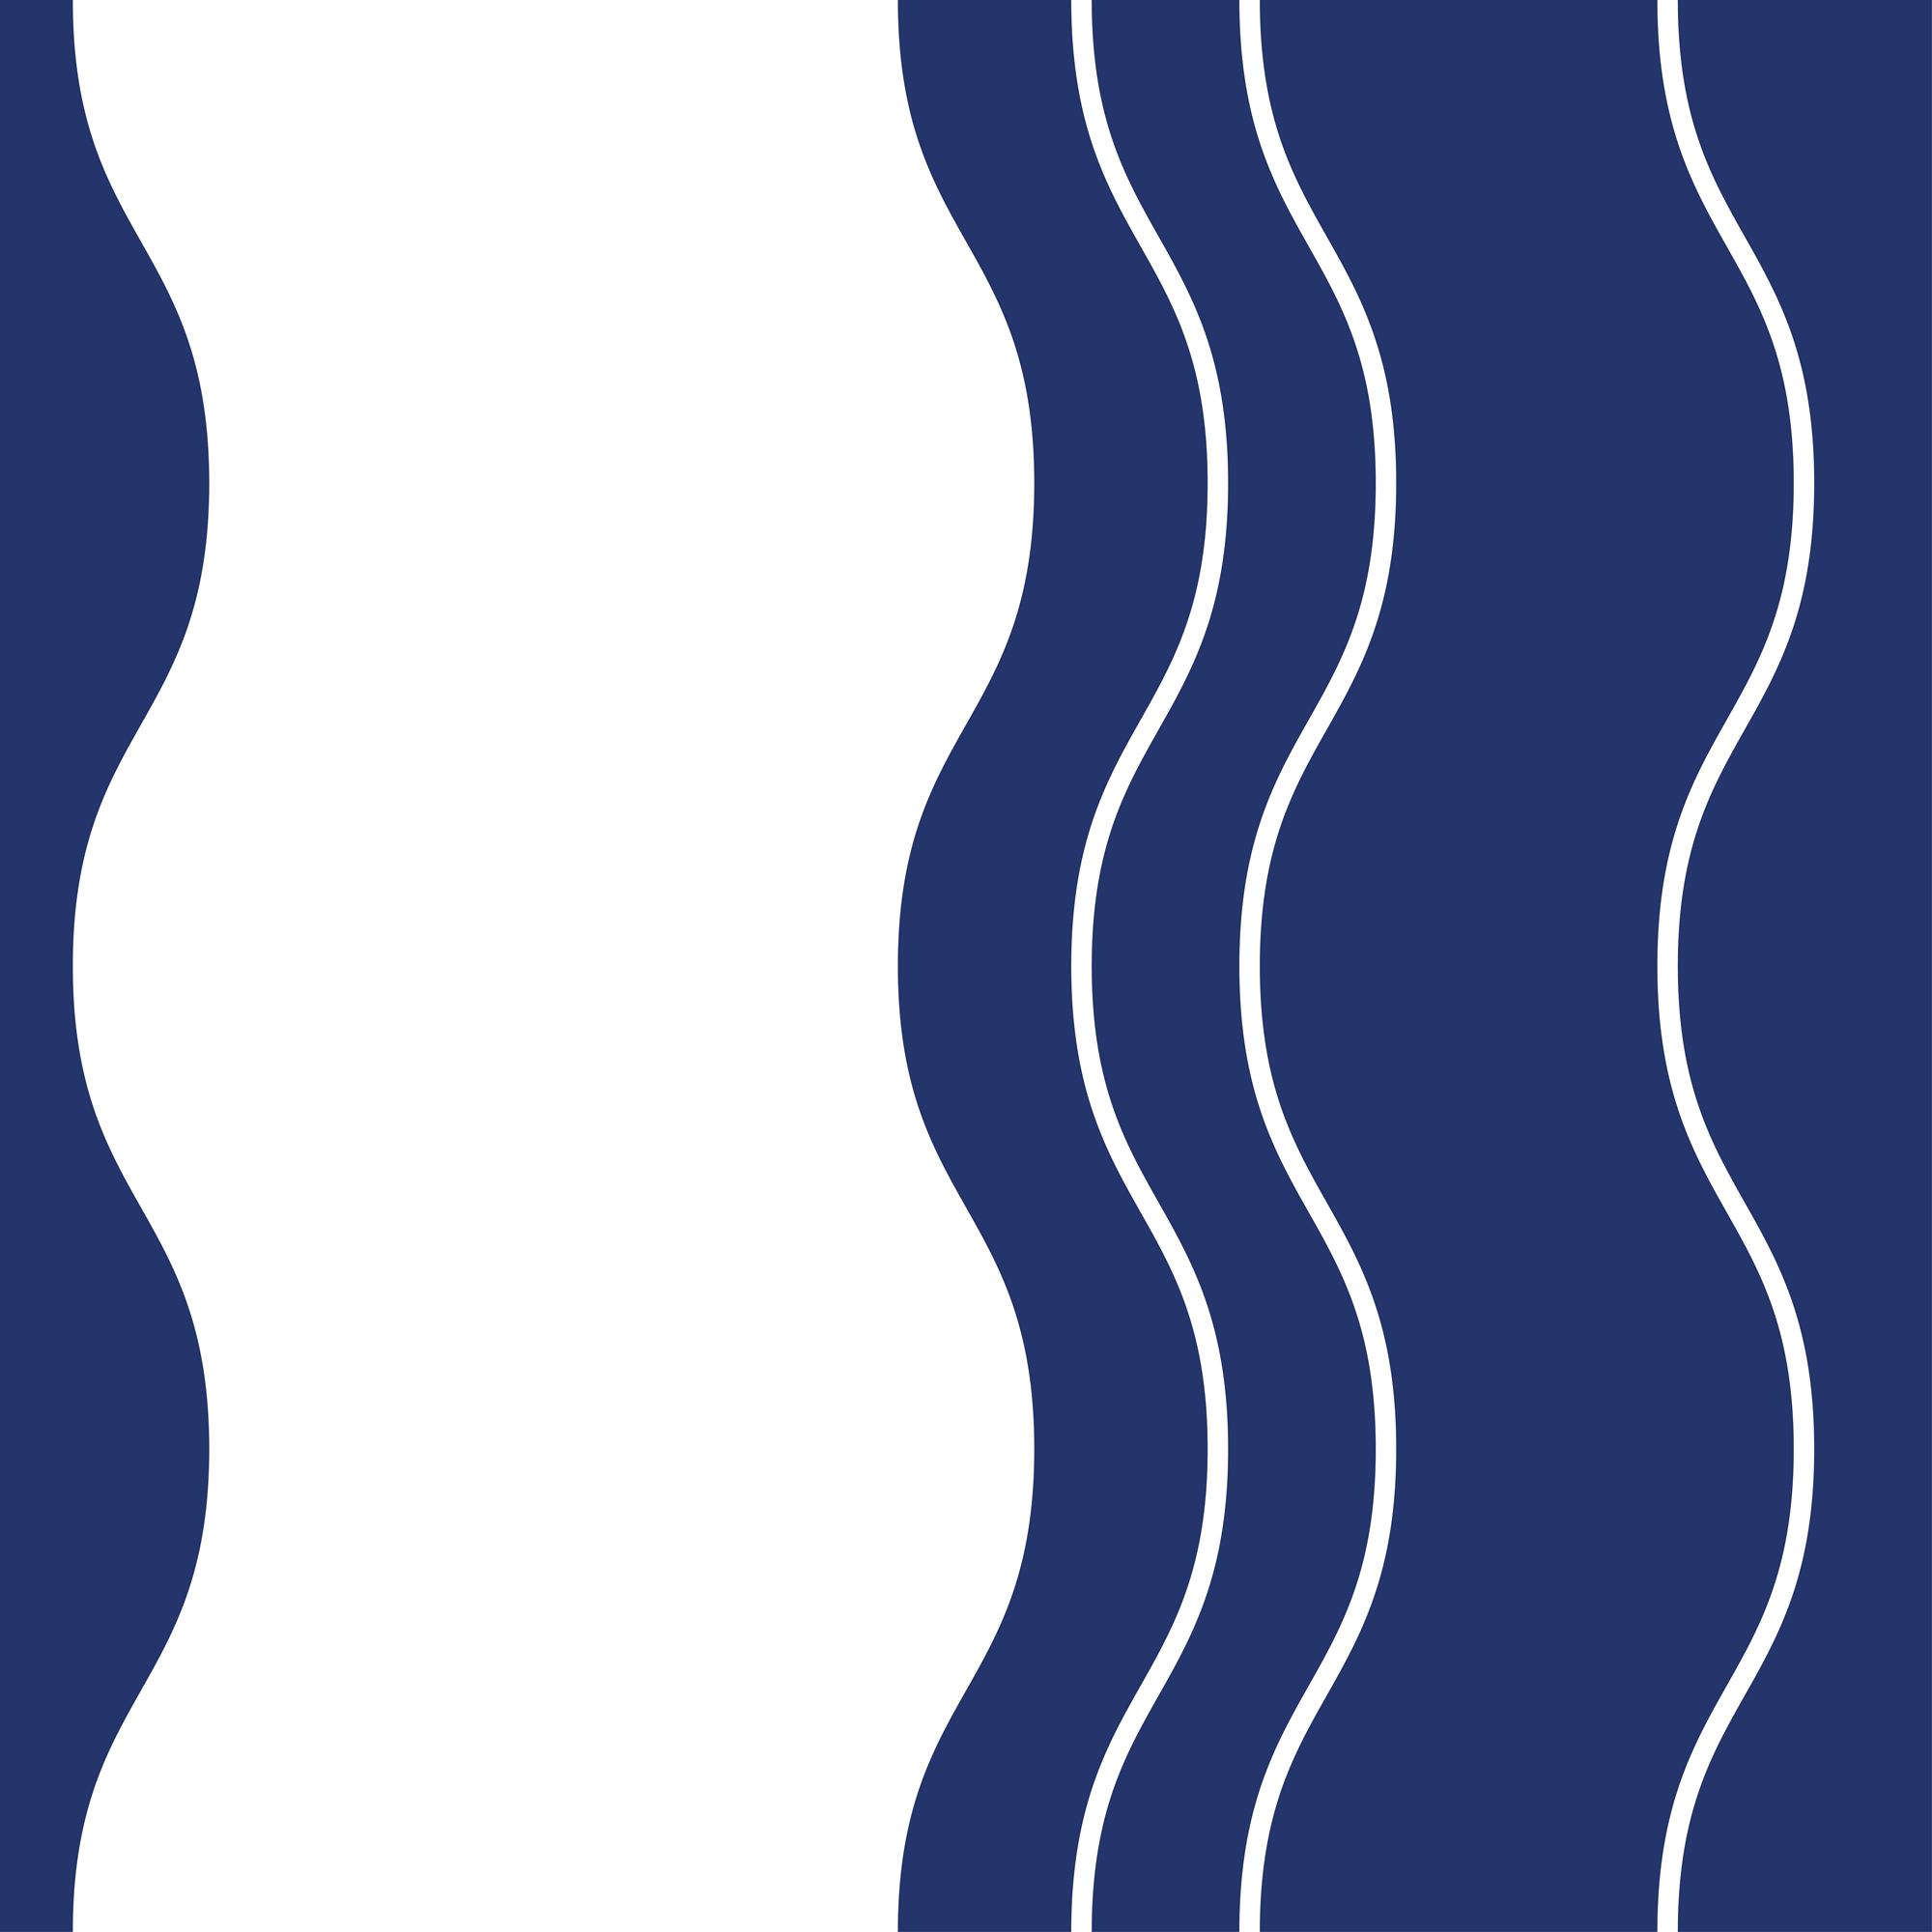 This-Film---Pattern-4.jpg